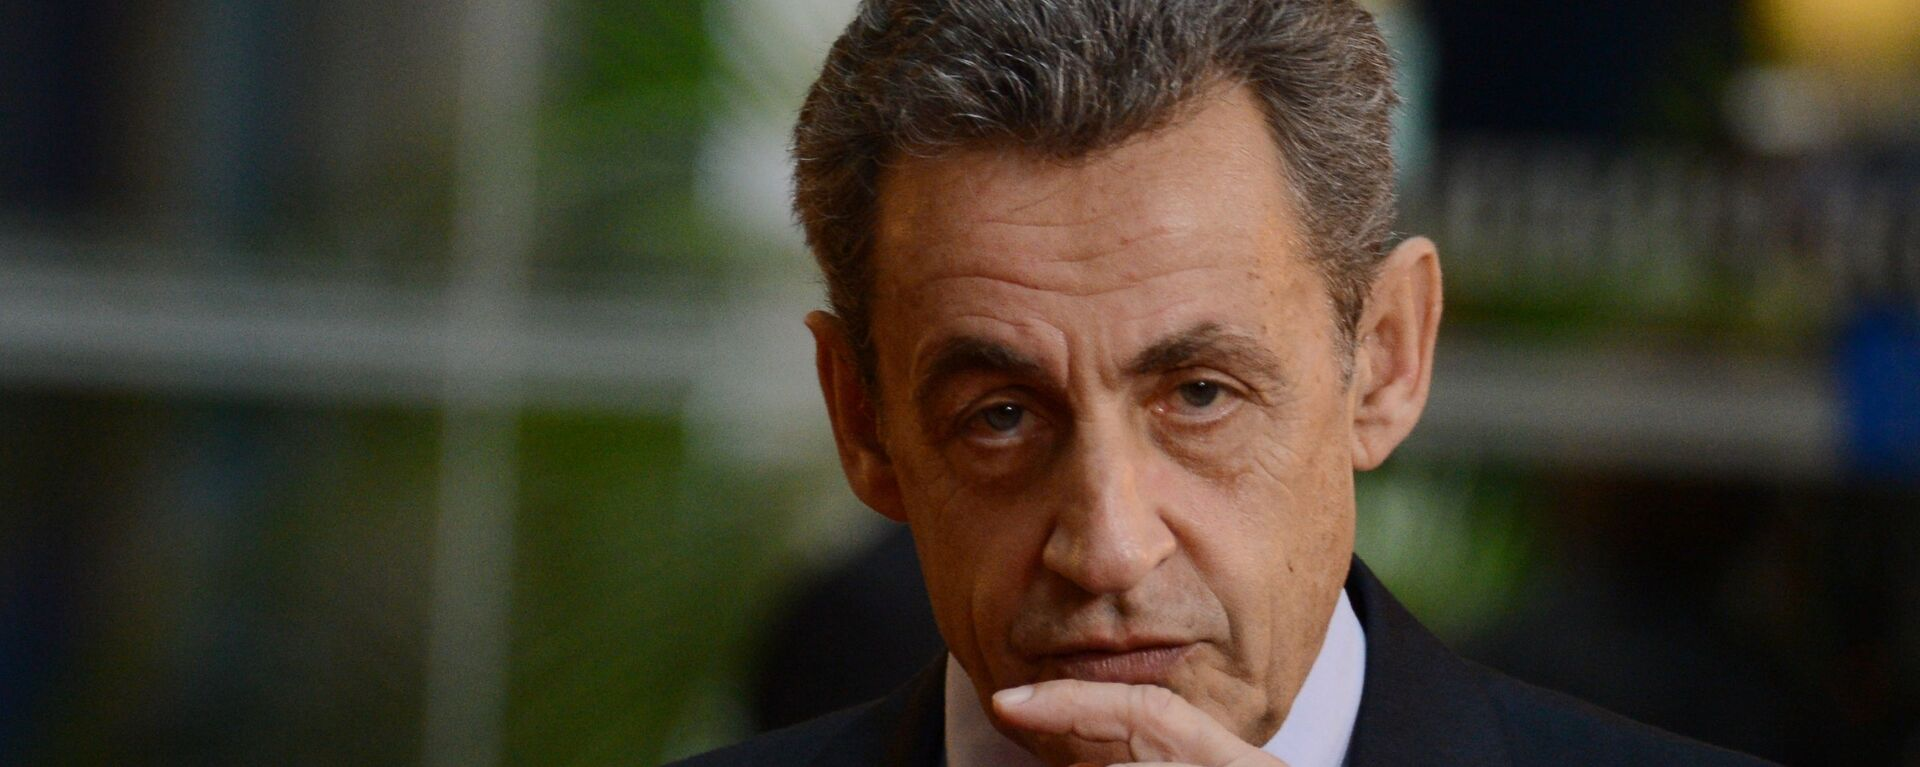 Były prezydent Francji Nicolas Sarkozy - Sputnik Polska, 1920, 02.03.2021